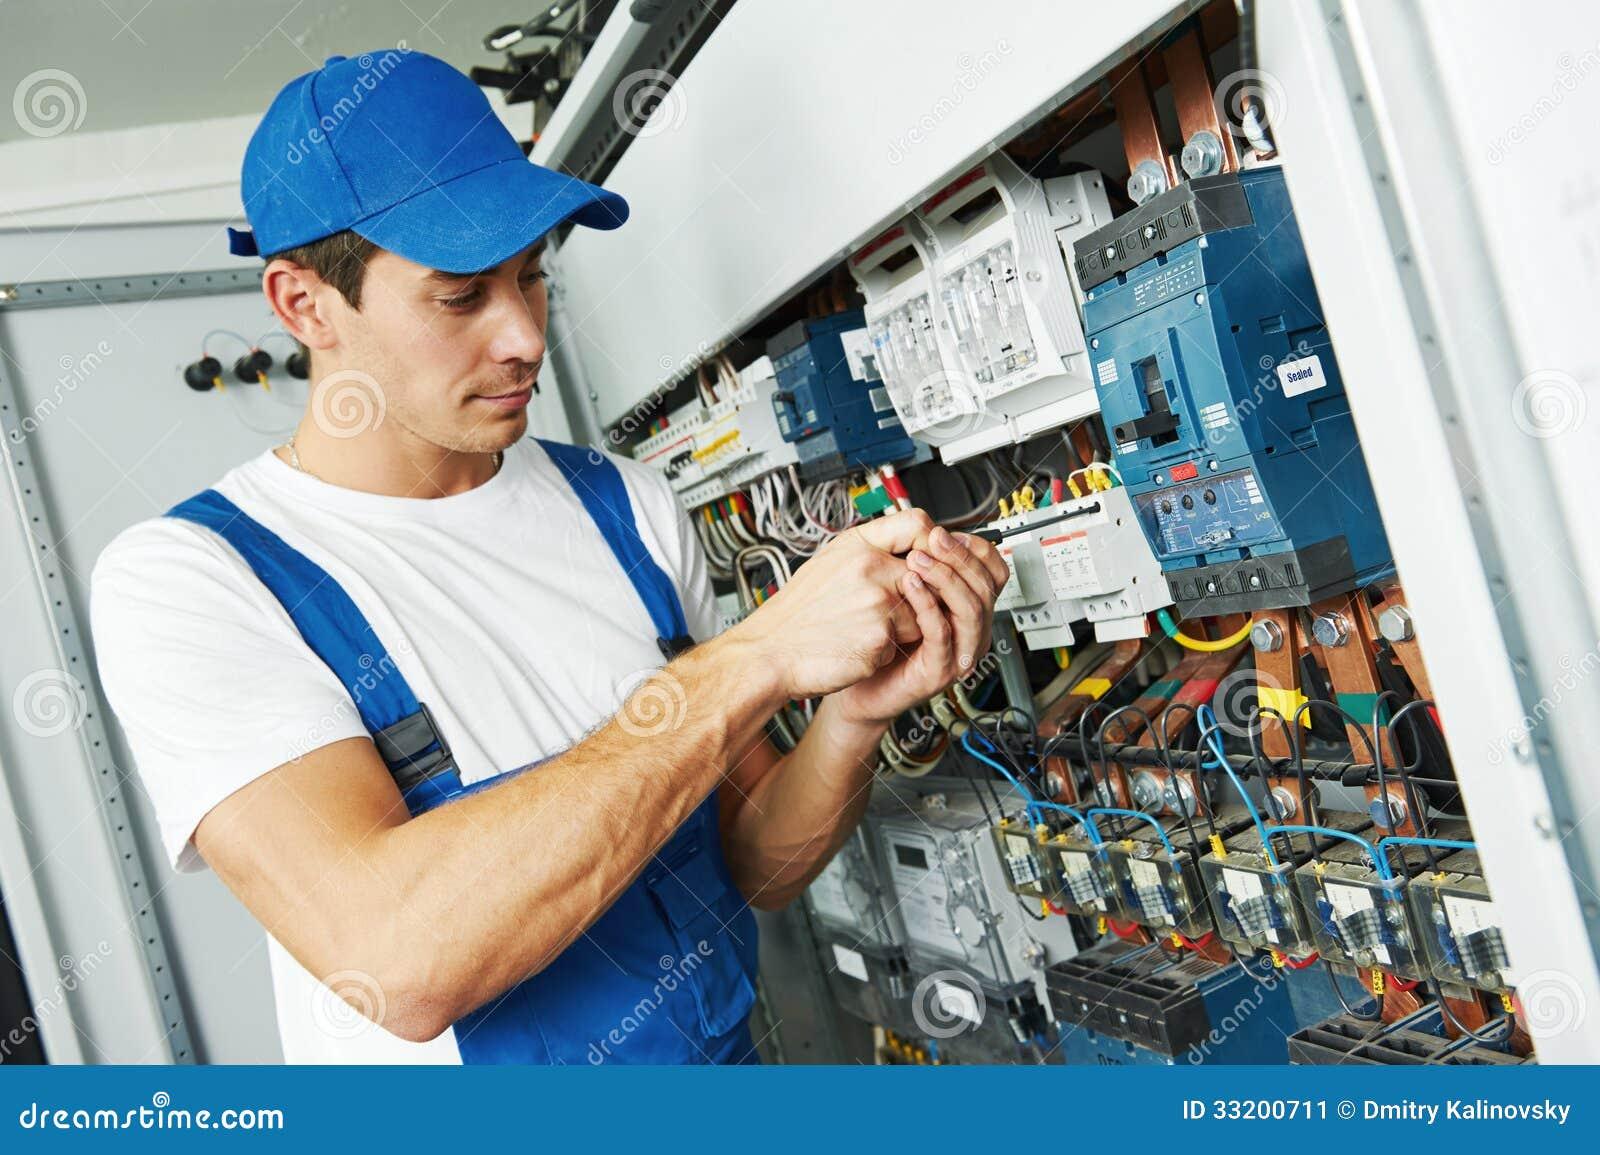 adult electrician engineer worker stock image image. Black Bedroom Furniture Sets. Home Design Ideas